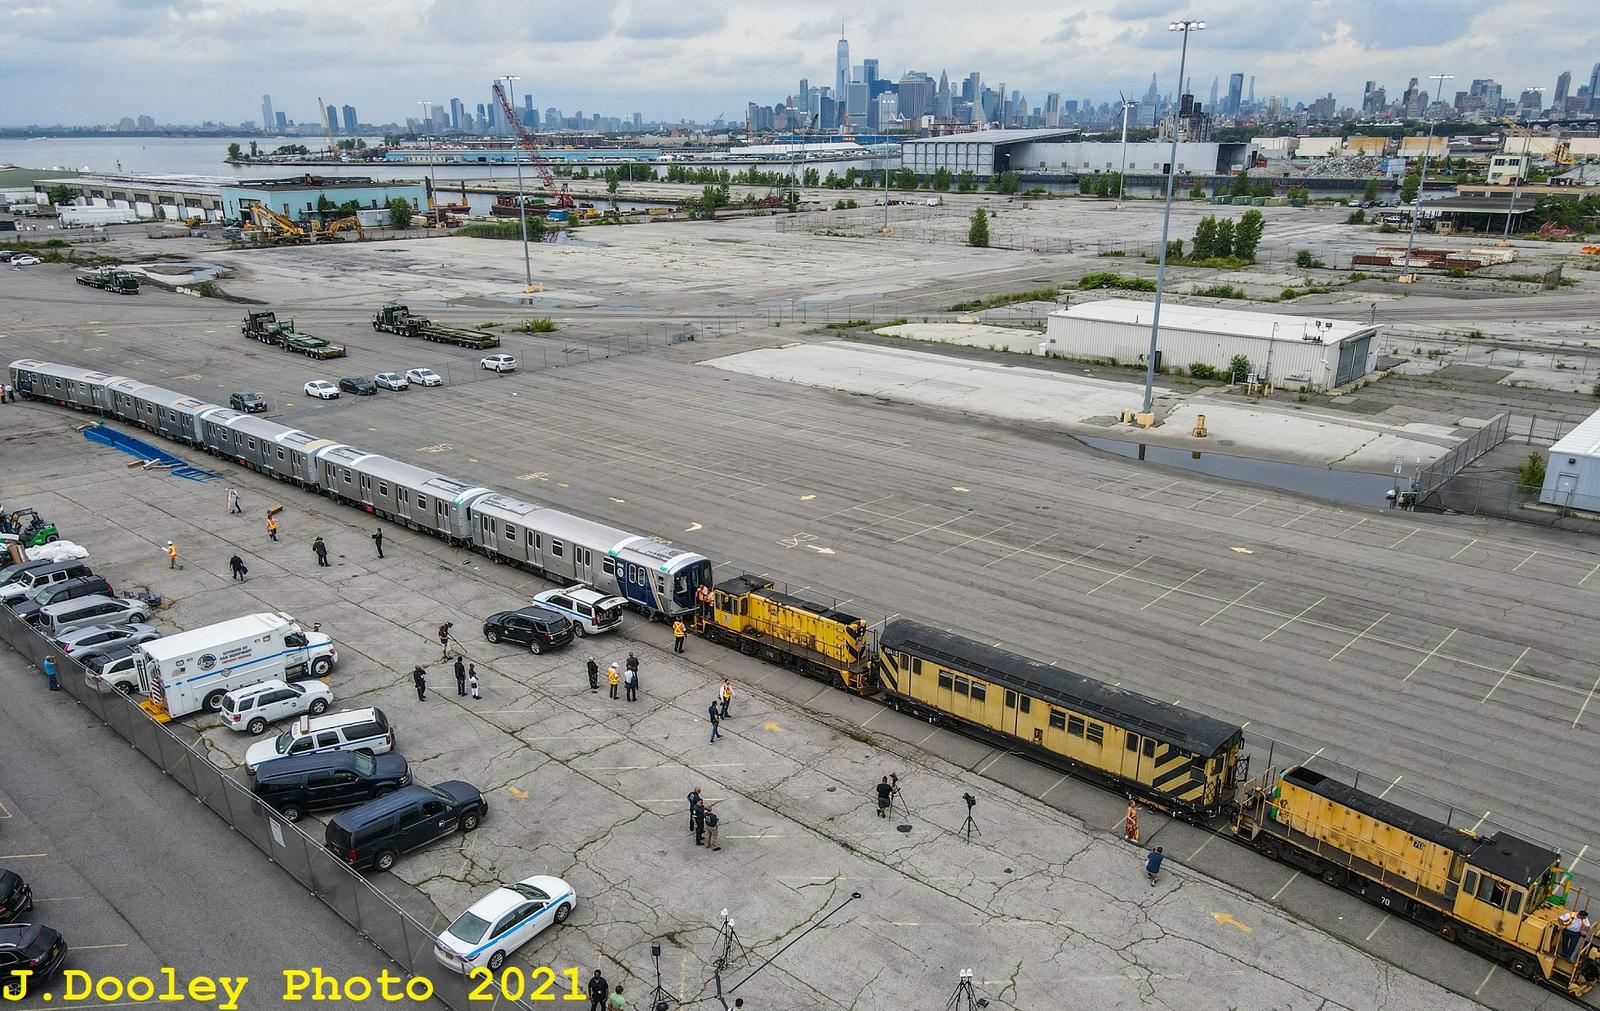 (846k, 1600x1011)<br><b>Country:</b> United States<br><b>City:</b> New York<br><b>System:</b> New York City Transit<br><b>Car:</b> R-211 (Kawasaki, 2021-)  <br><b>Photo by:</b> John Dooley<br><b>Date:</b> 7/1/2021<br><b>Notes:</b> R-211 delivery and press conference.<br><b>Viewed (this week/total):</b> 3 / 190